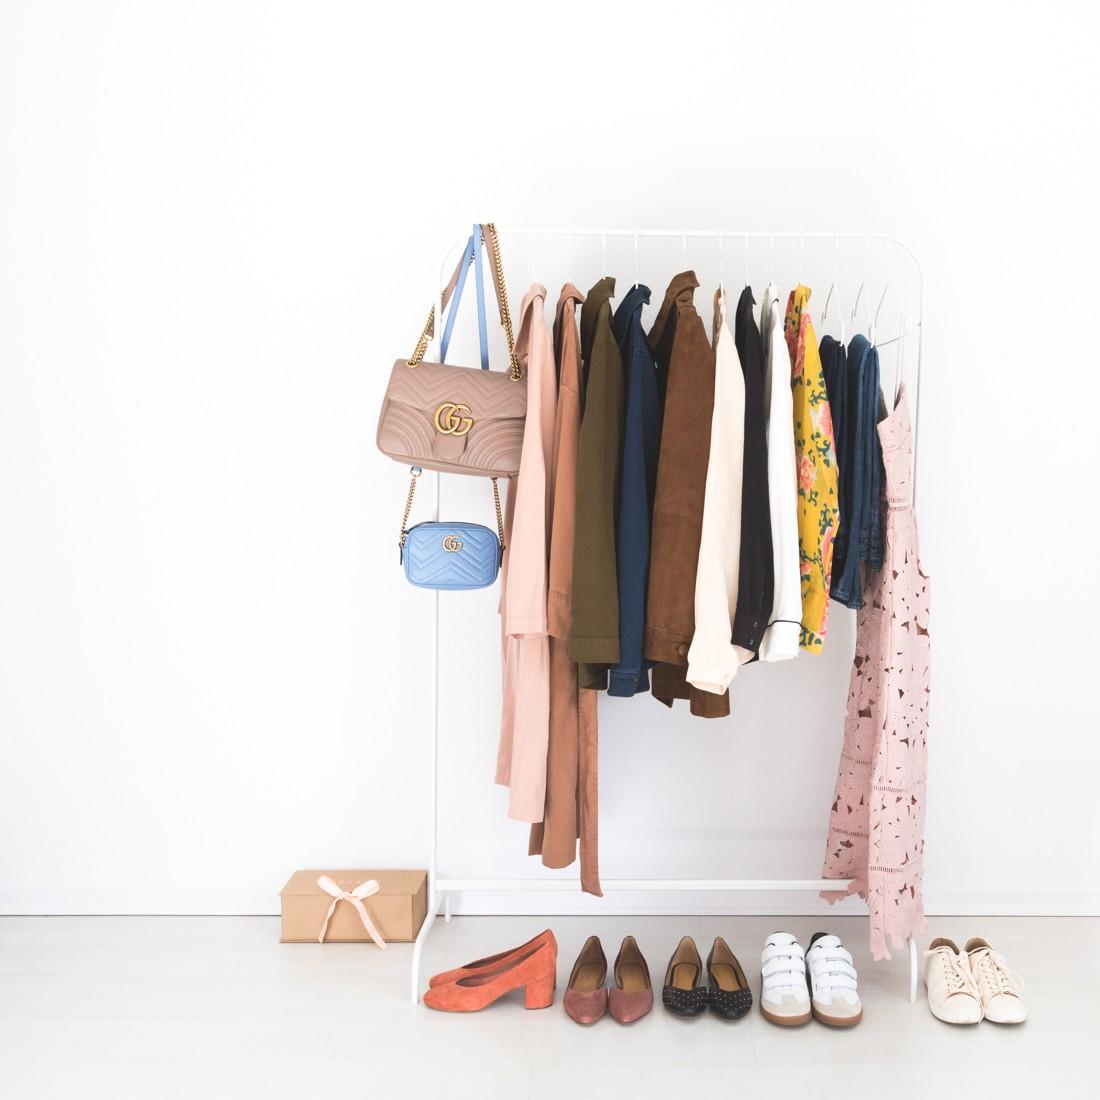 capsule_wardrobe_sezane_paris_denim_gucci_marmont_GG_bag_copyright_Pauline_paulinefashionblog_com-1